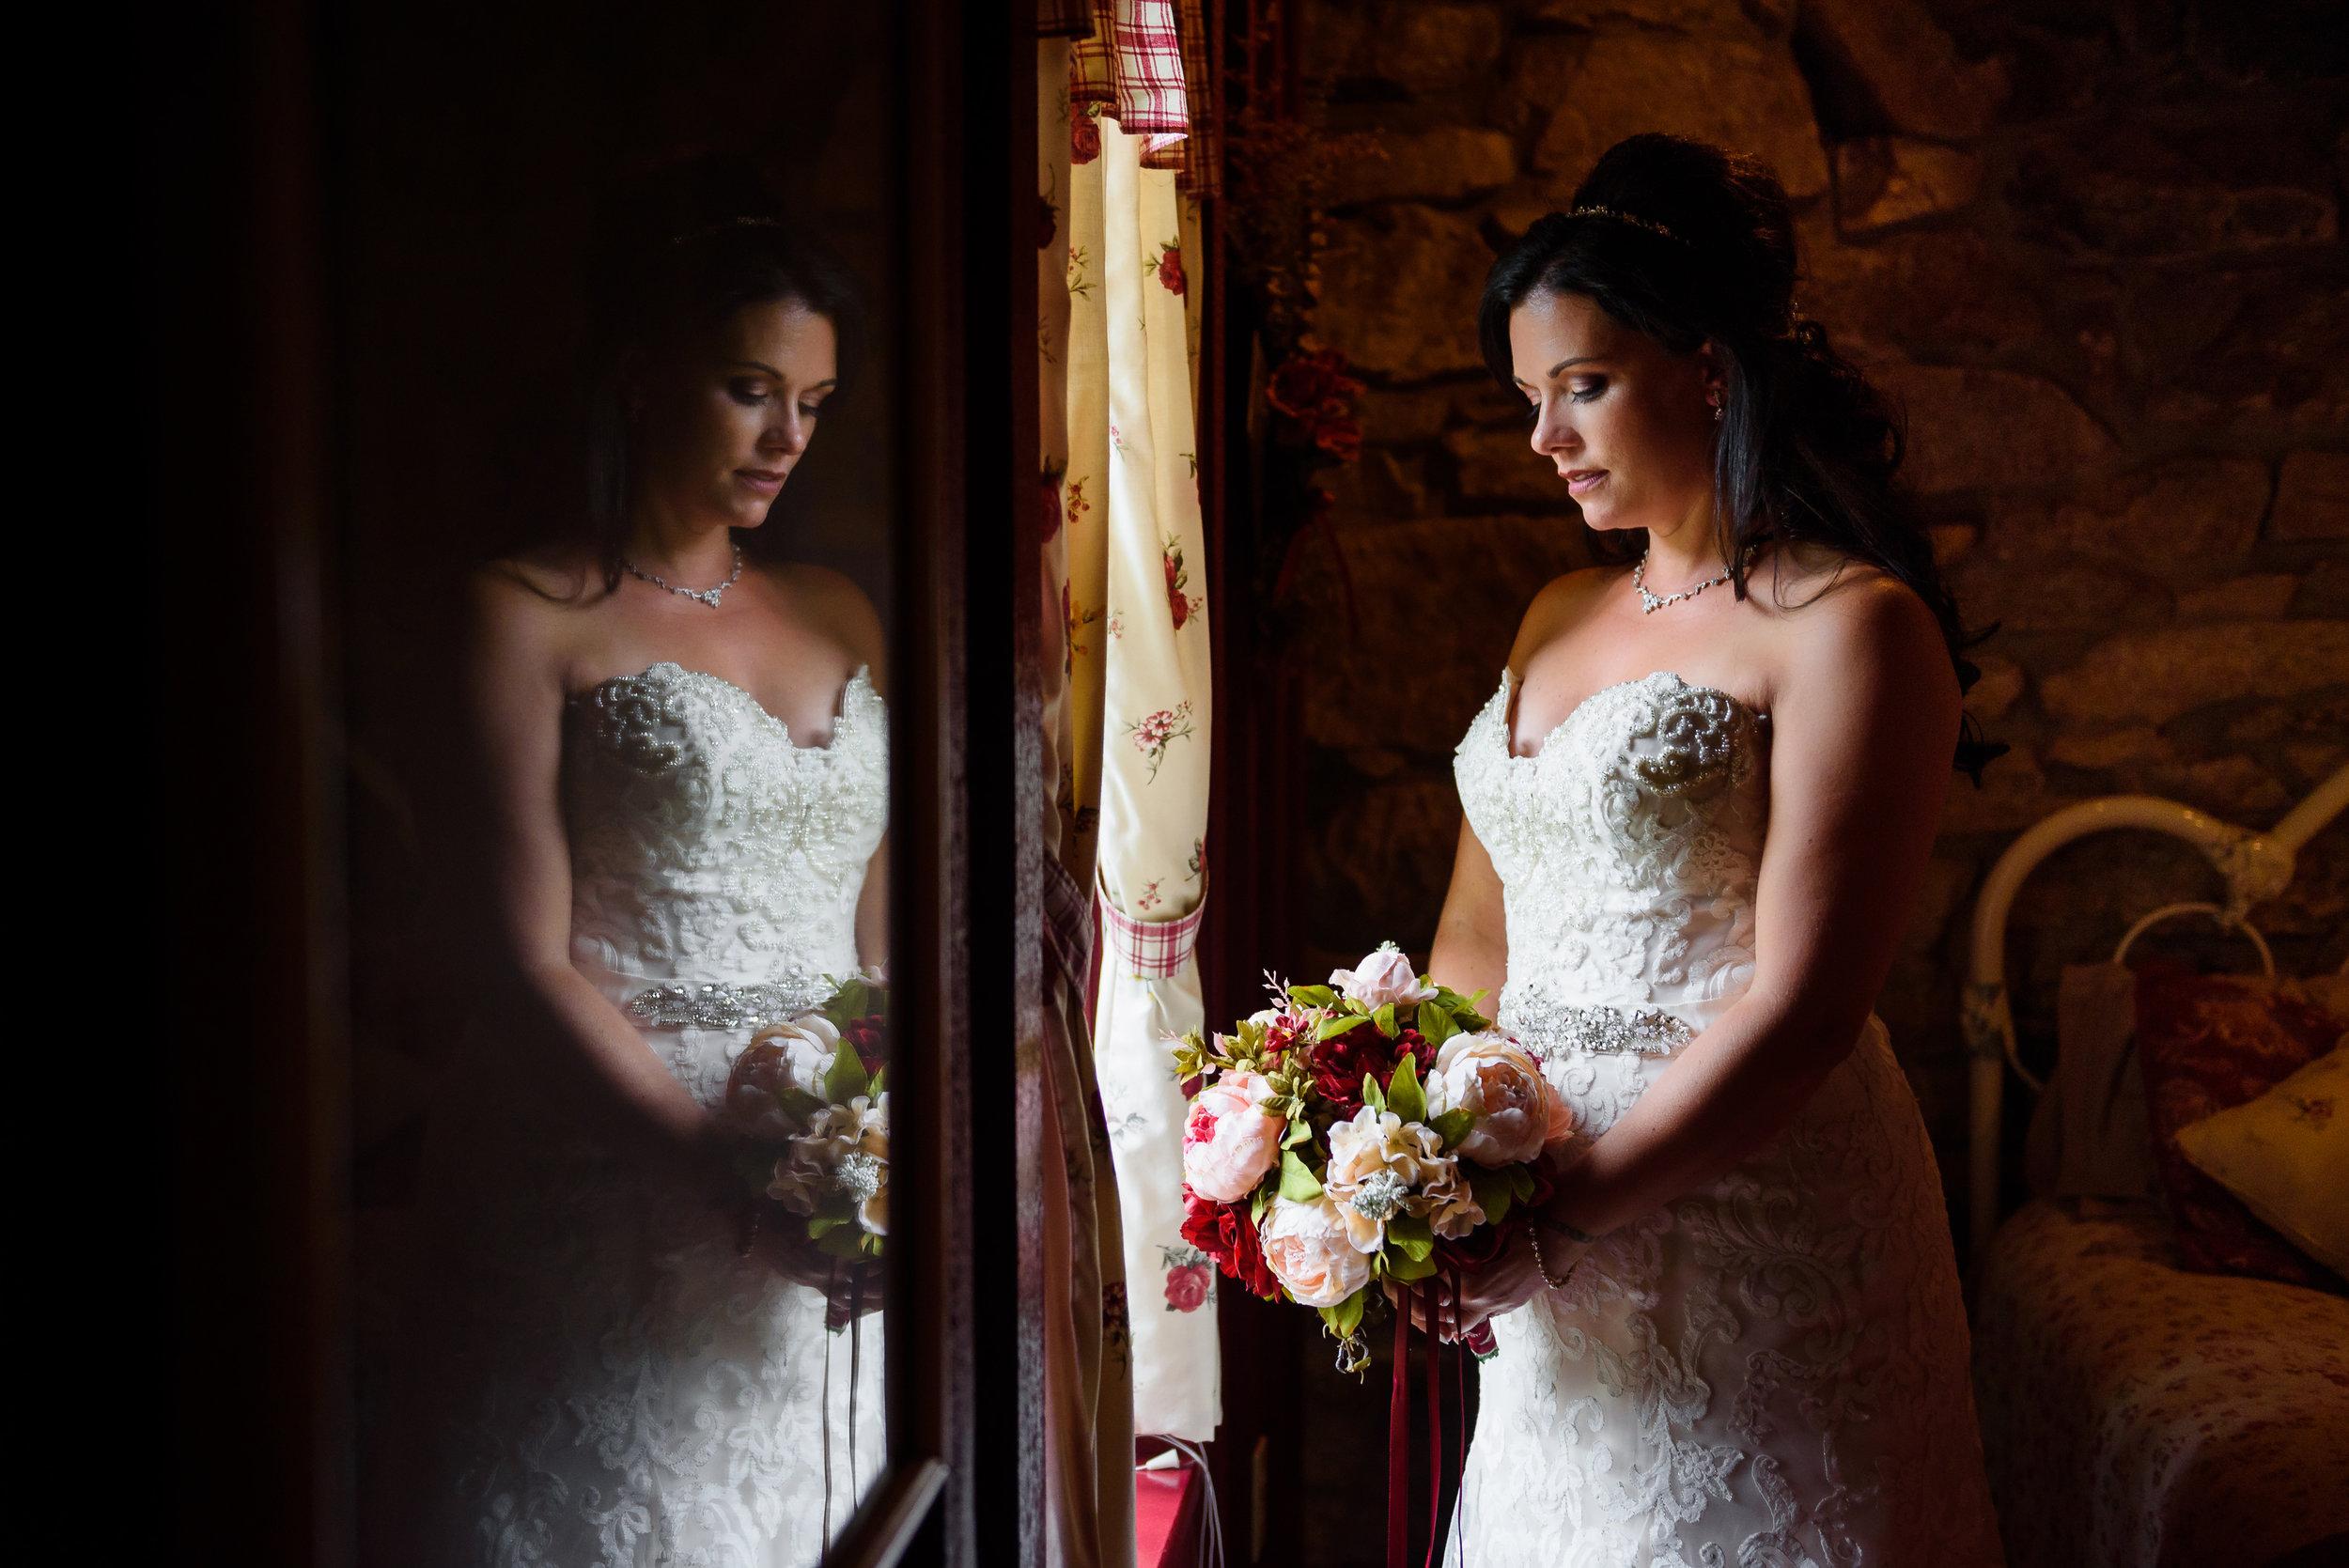 Heather-Jared-Wedding-Garcia-Photography-7820.jpg